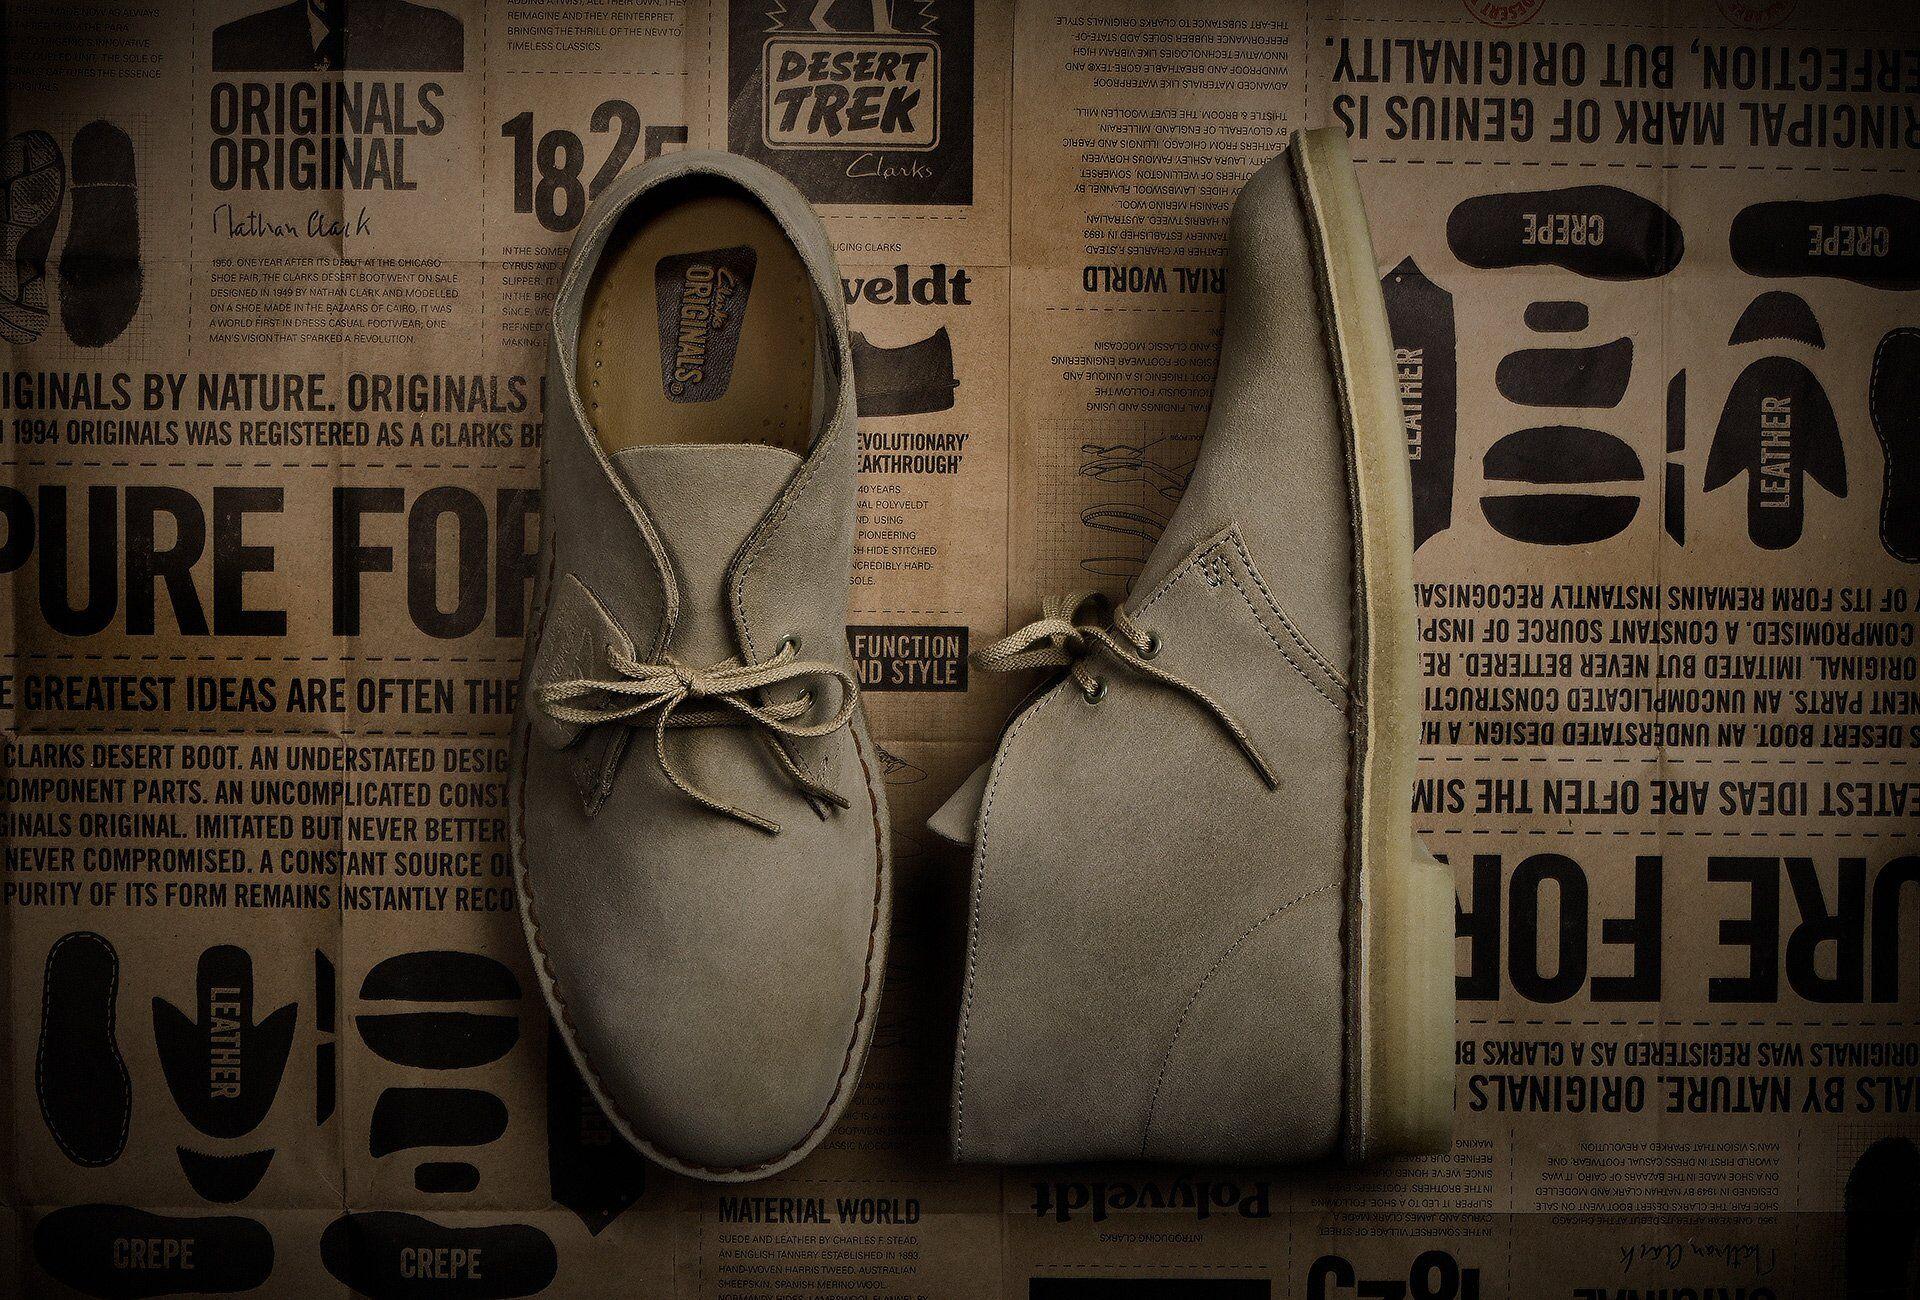 Clarks Originals Desert Boot from 1825.